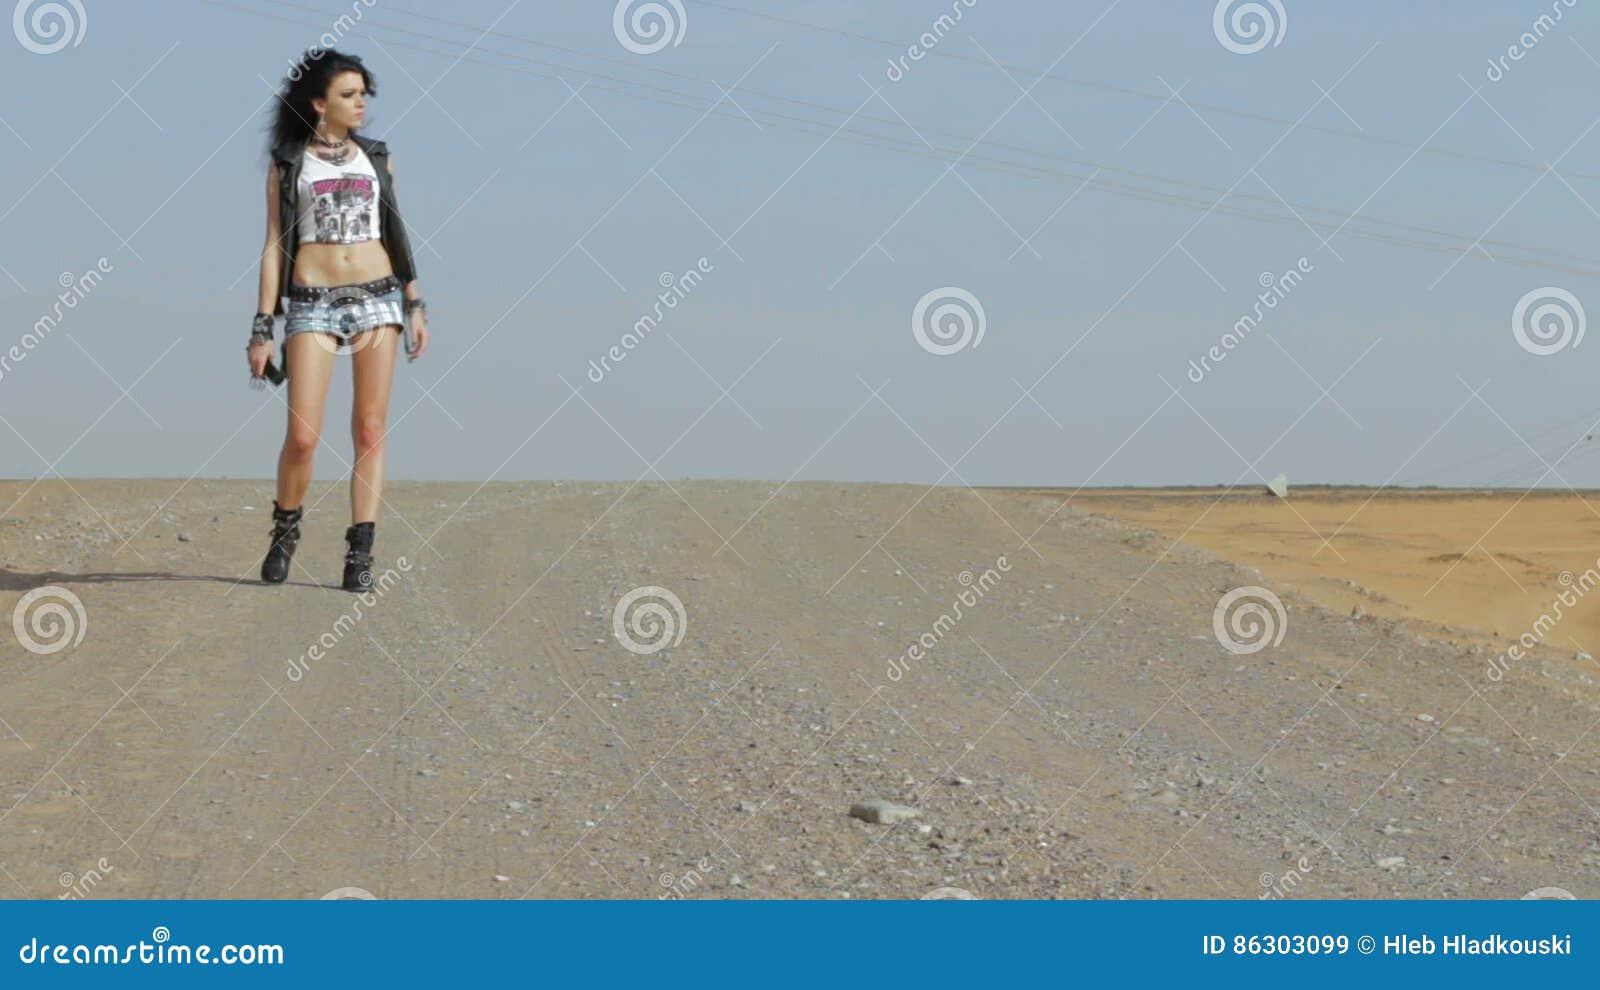 Girl walking on the desert road. HD stock video footage